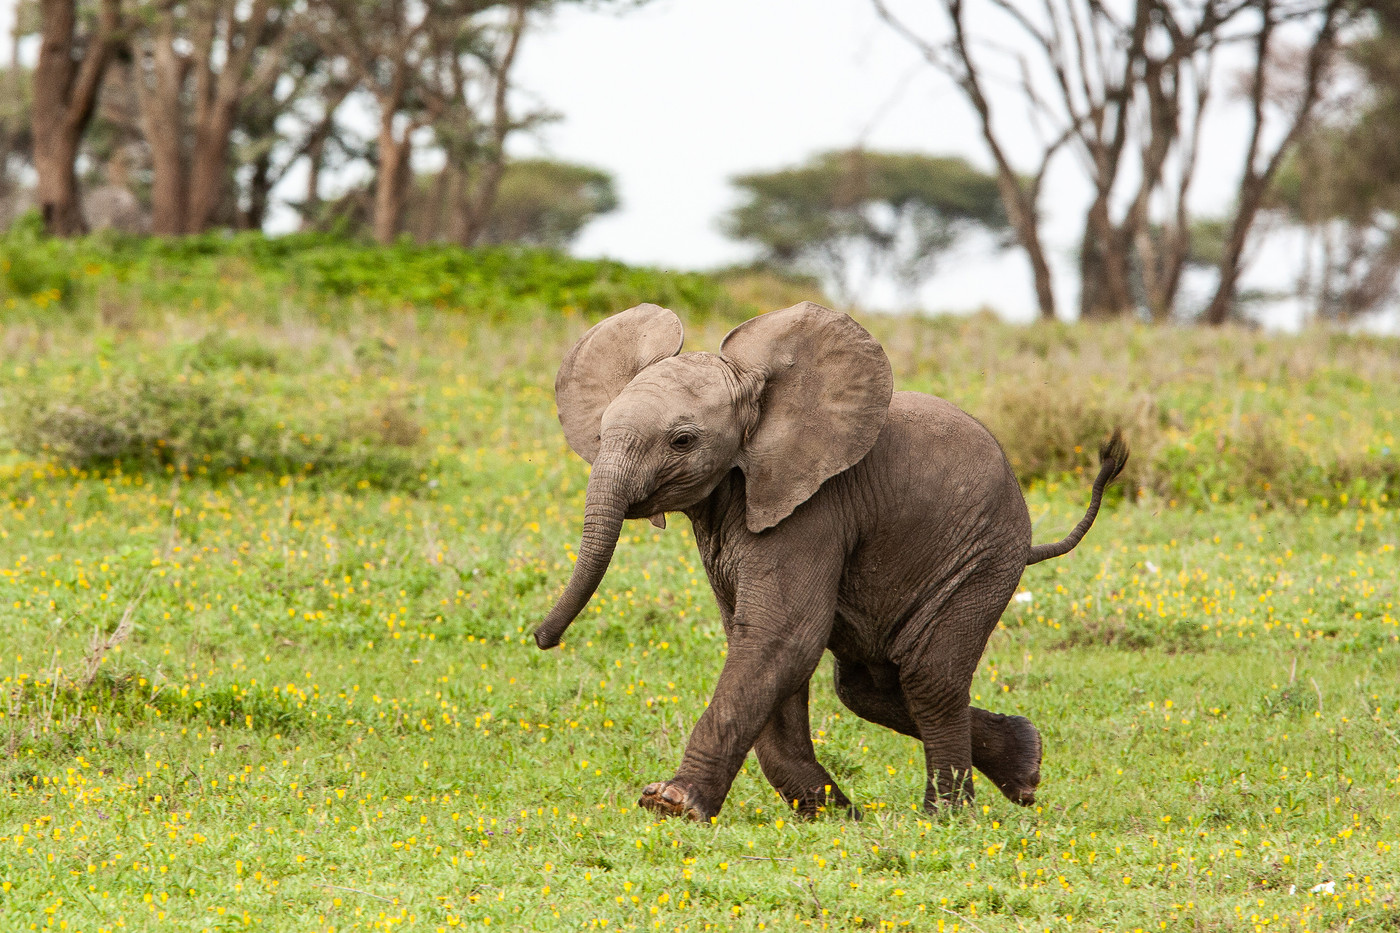 Elephant calf in the Serengeti NP, Tanzania